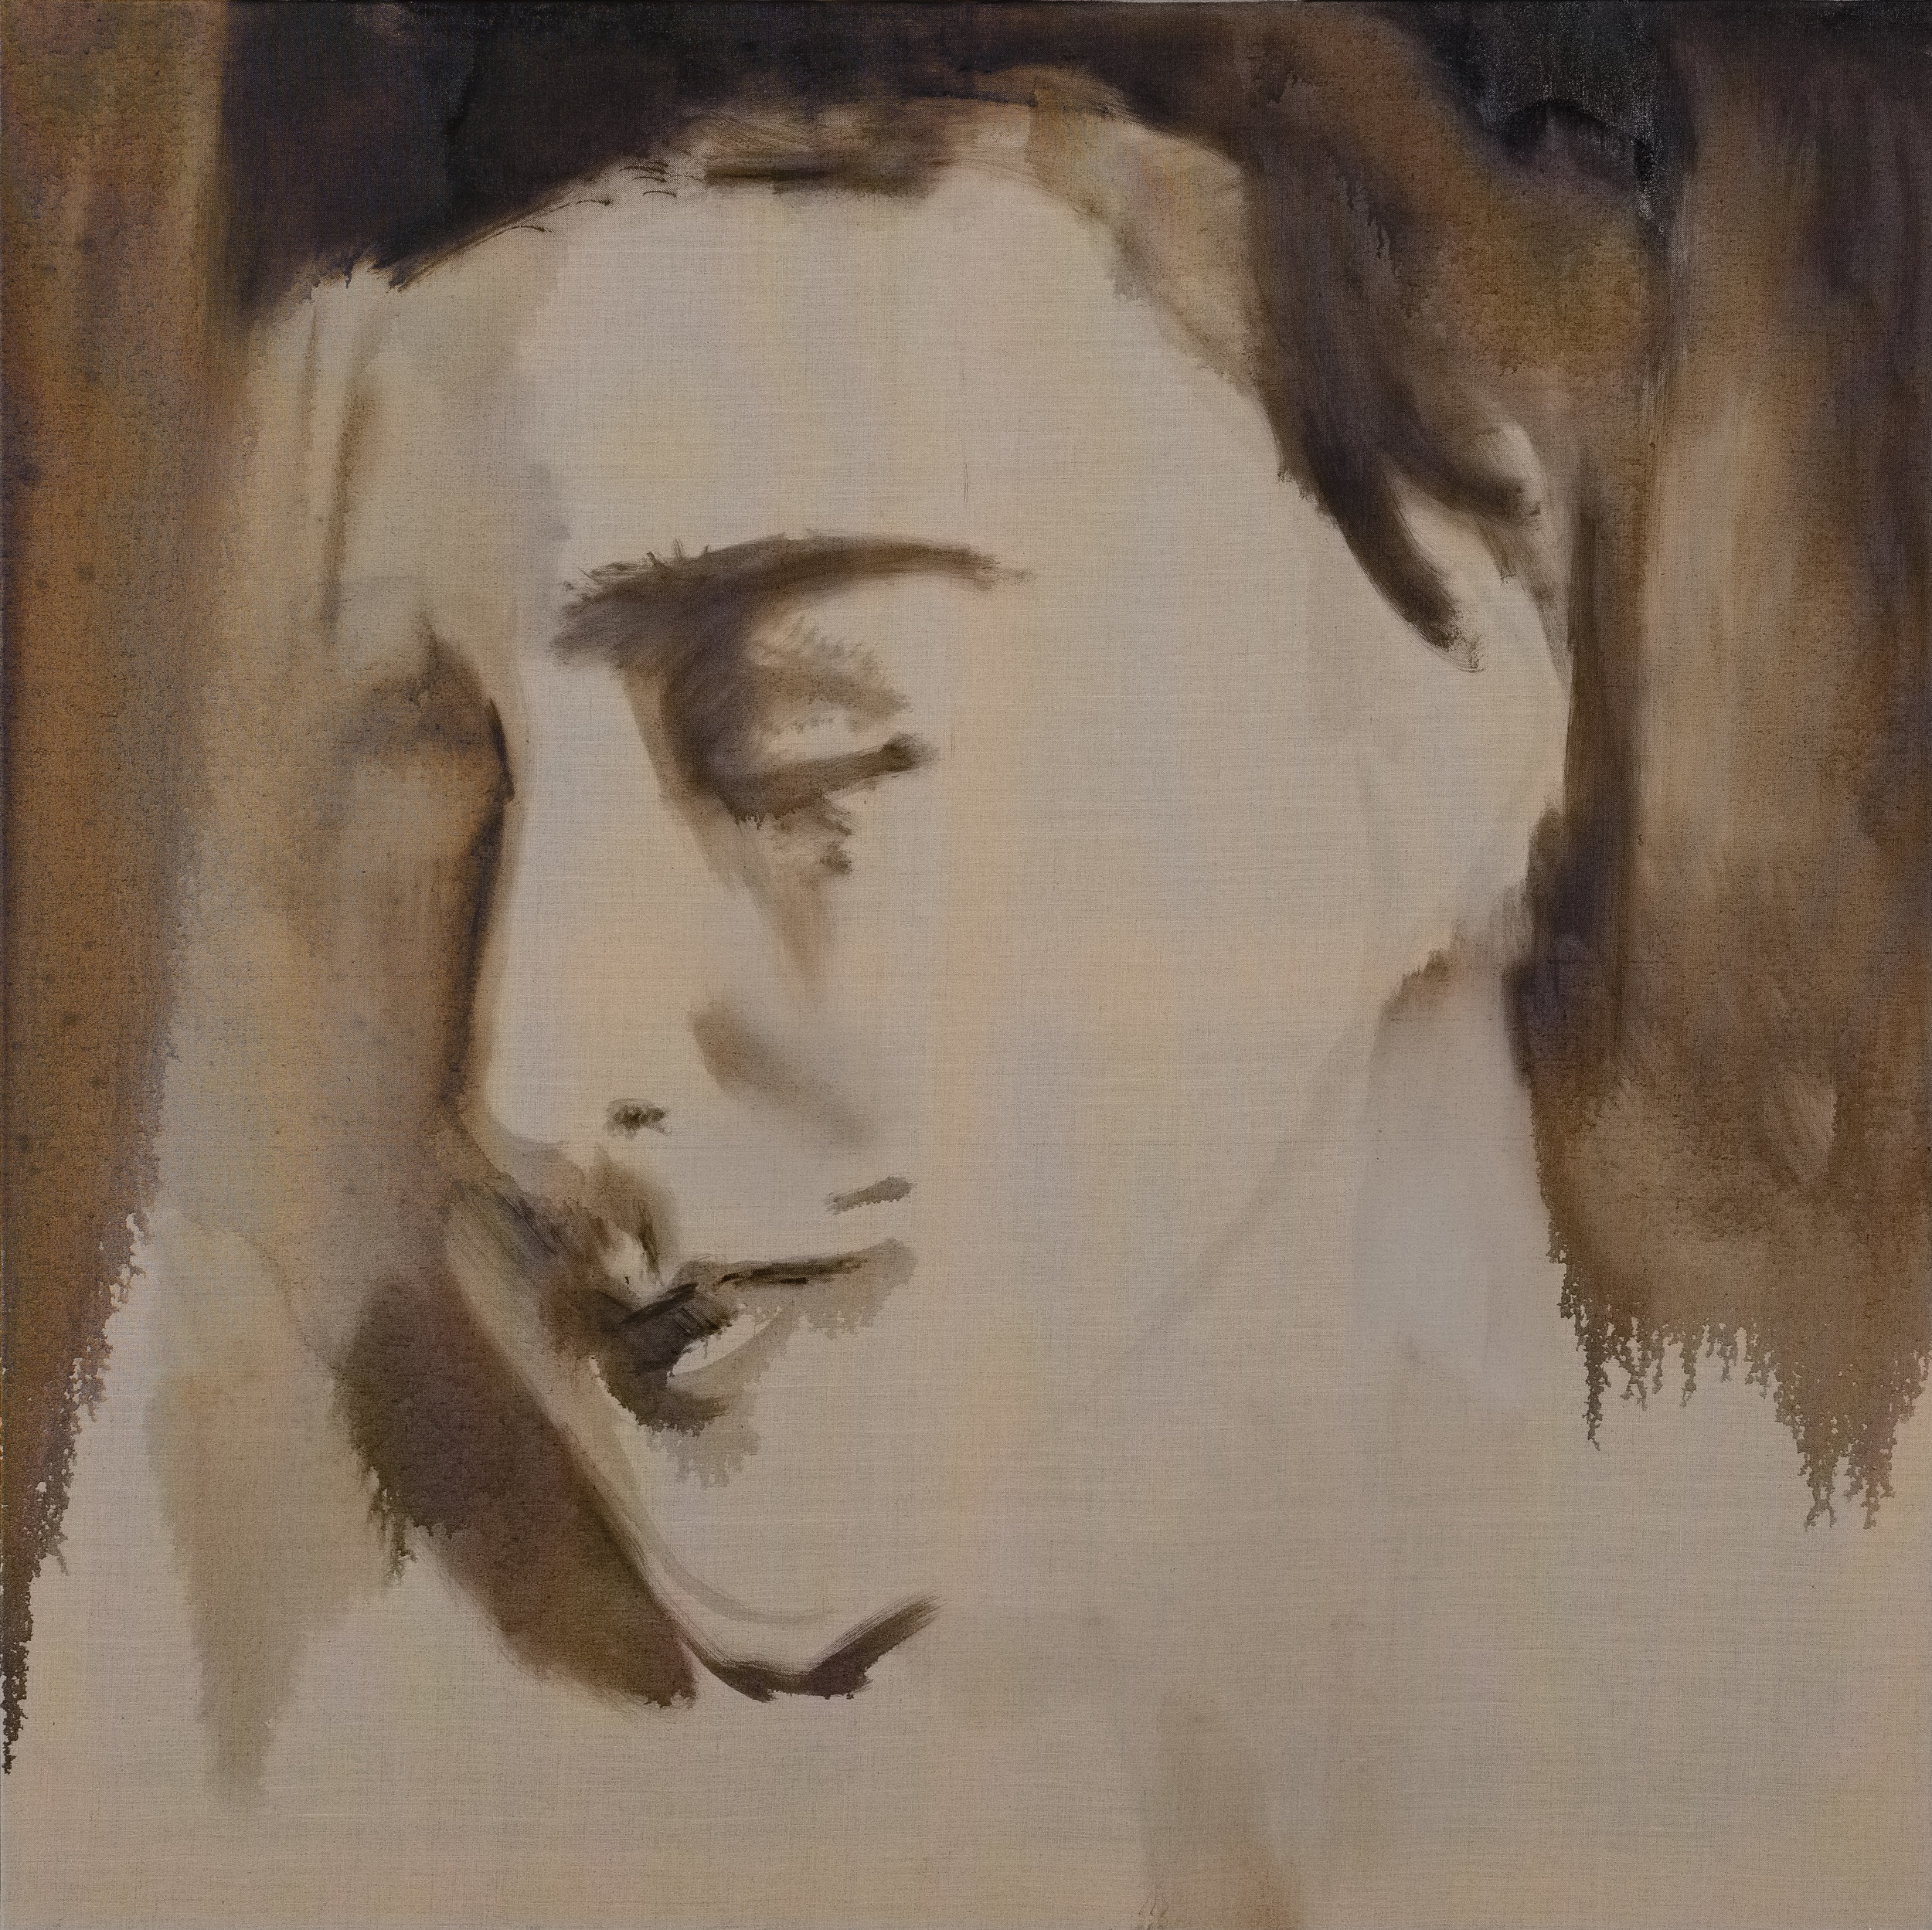 2017, Fissa 4, 130 x 130 cm.jpg